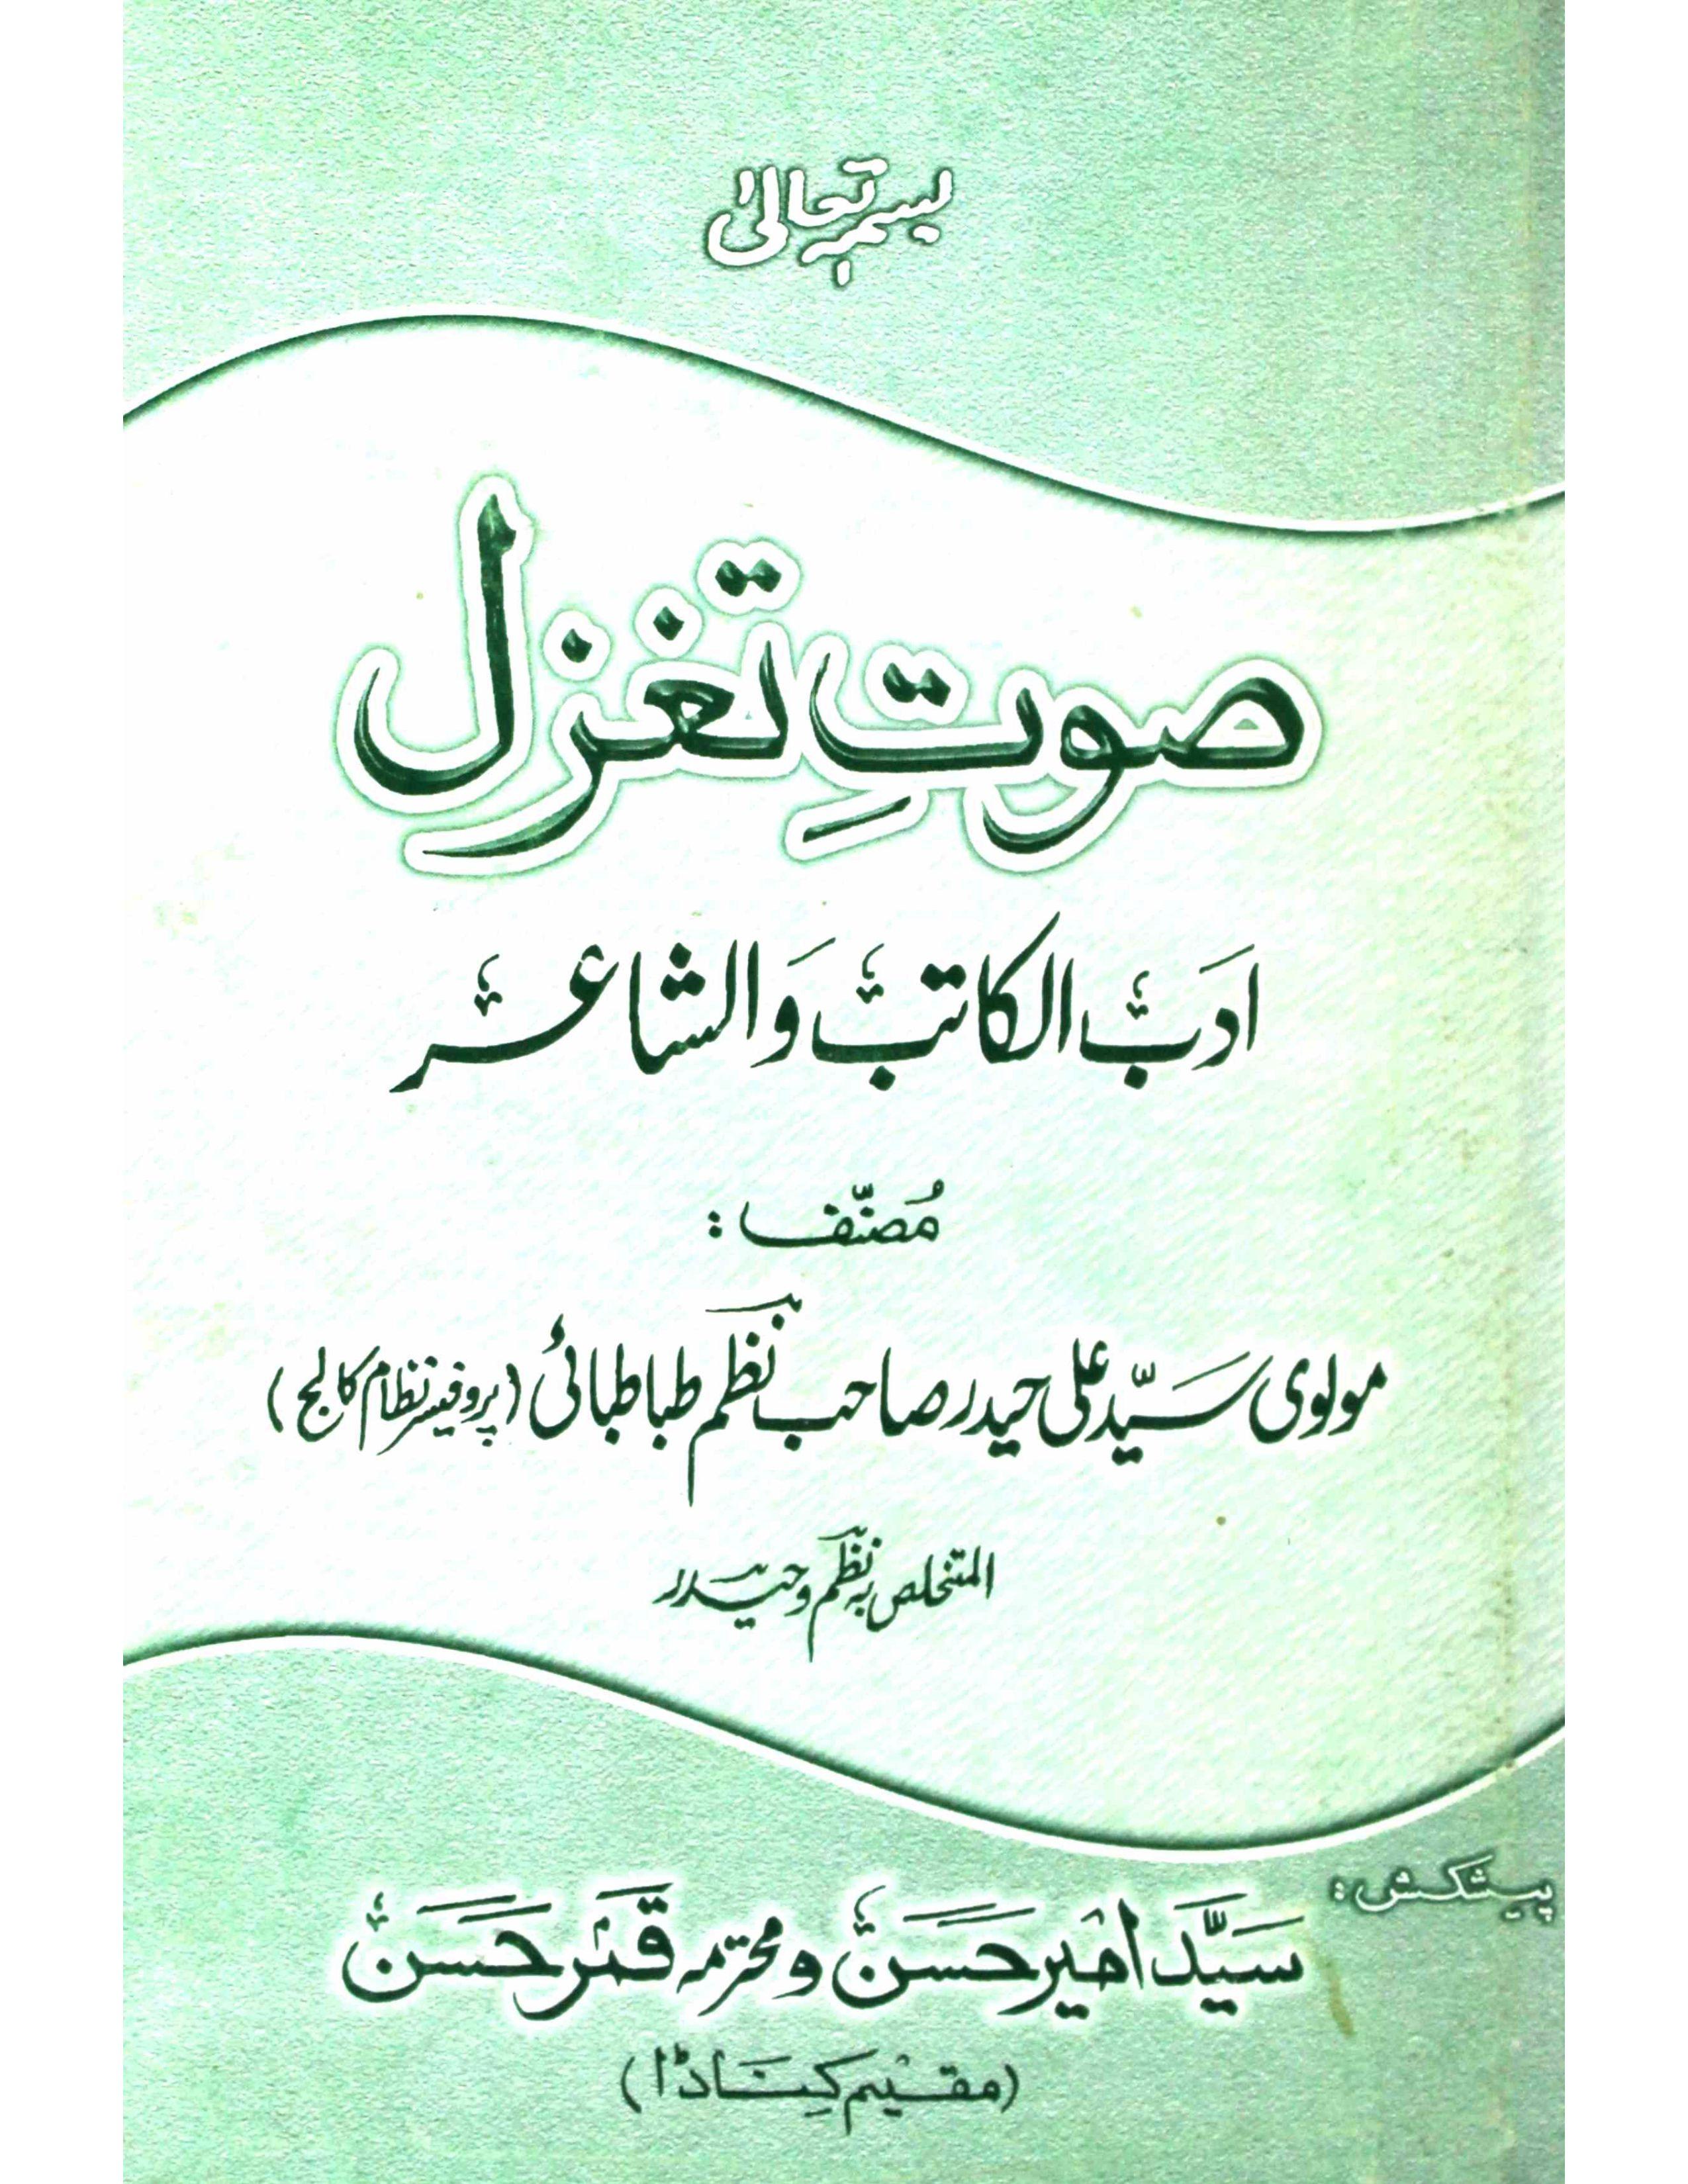 Saut-e-Taghazzul